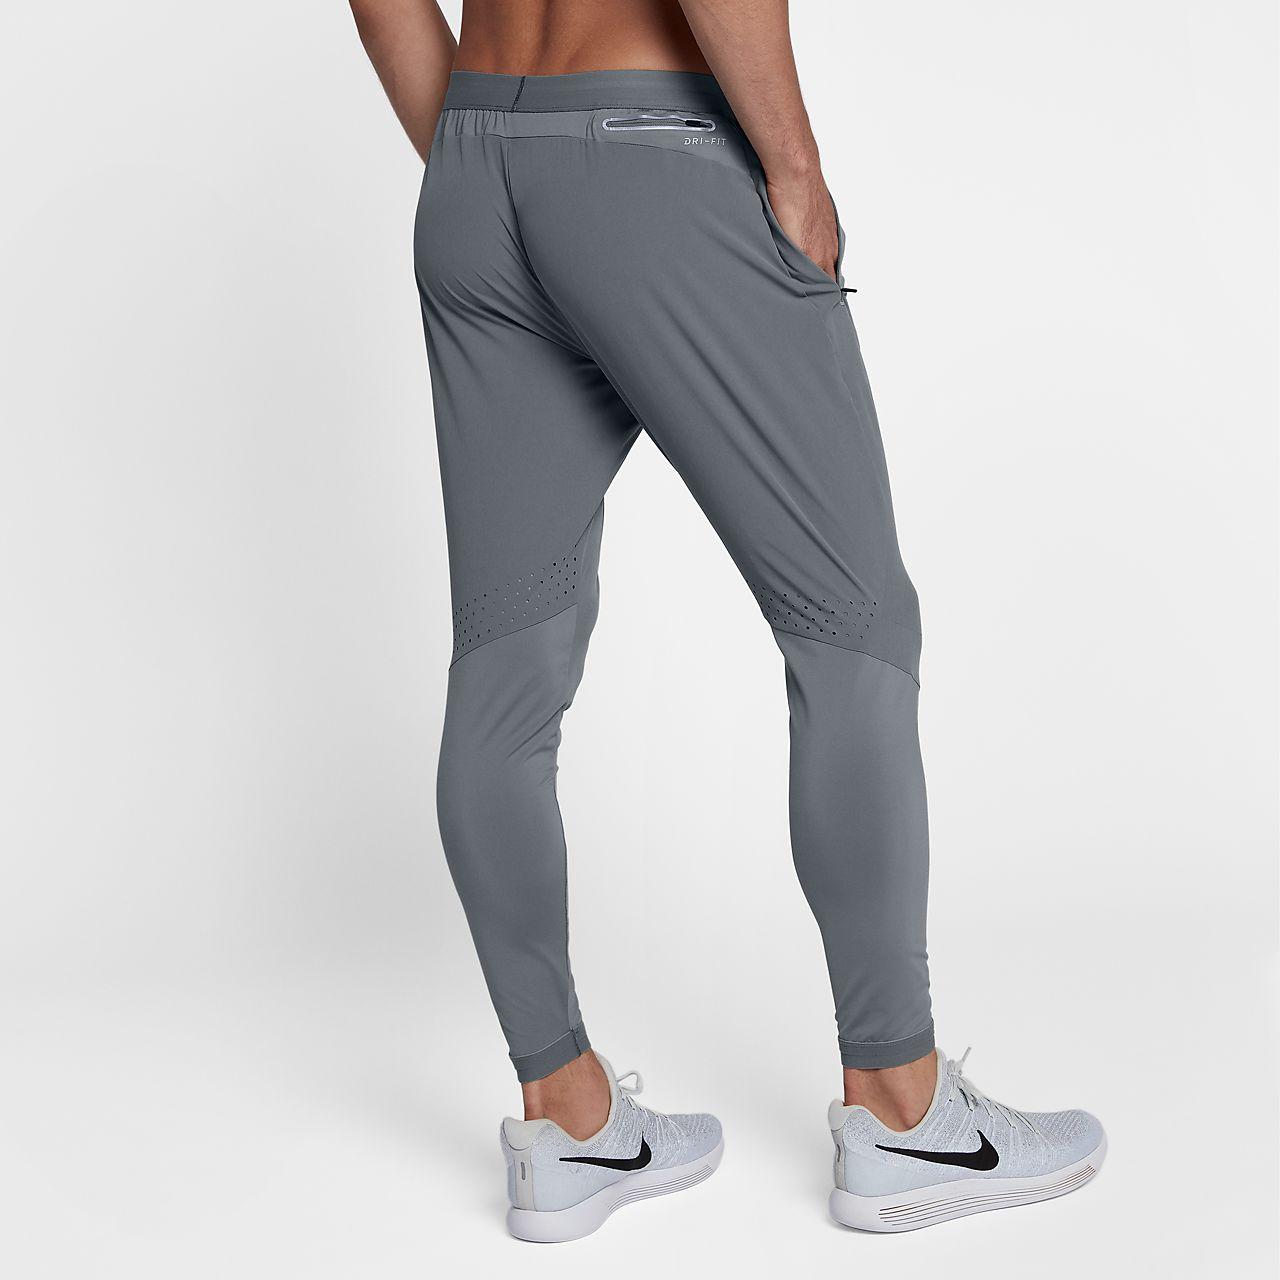 ... Pantalon de running Nike Swift 68 cm pour Homme